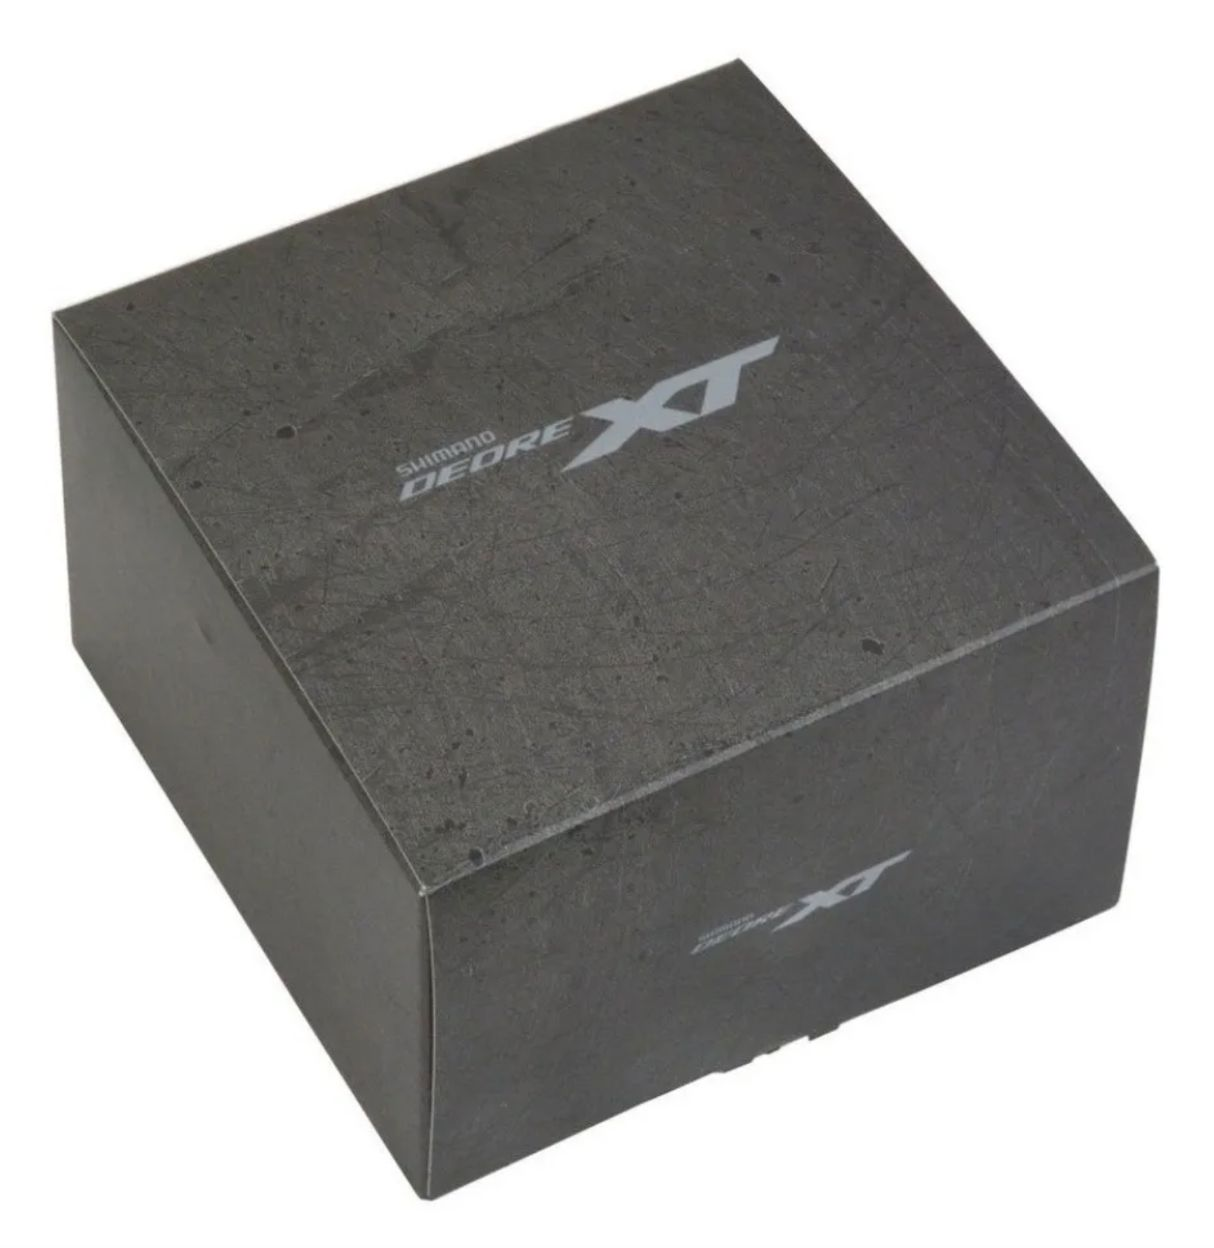 Cubo Shimano Deore Xt M8110 12x142mm Micro-spline 12v 28f